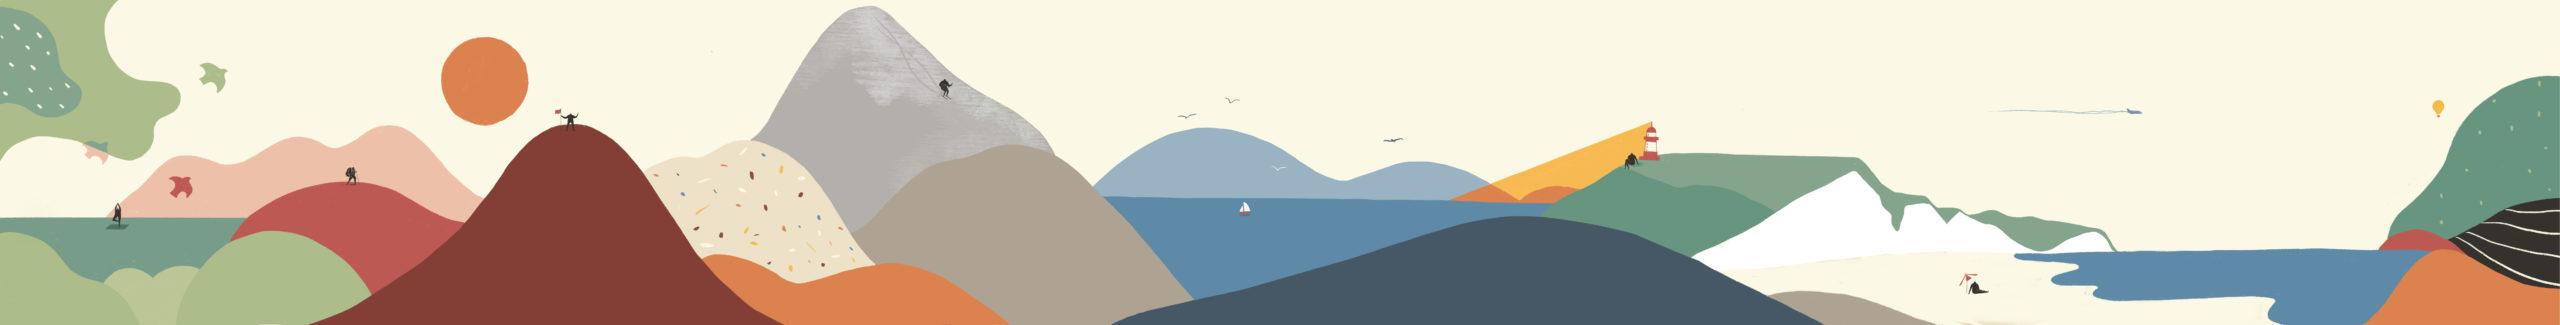 A-Journey_Illustration_01